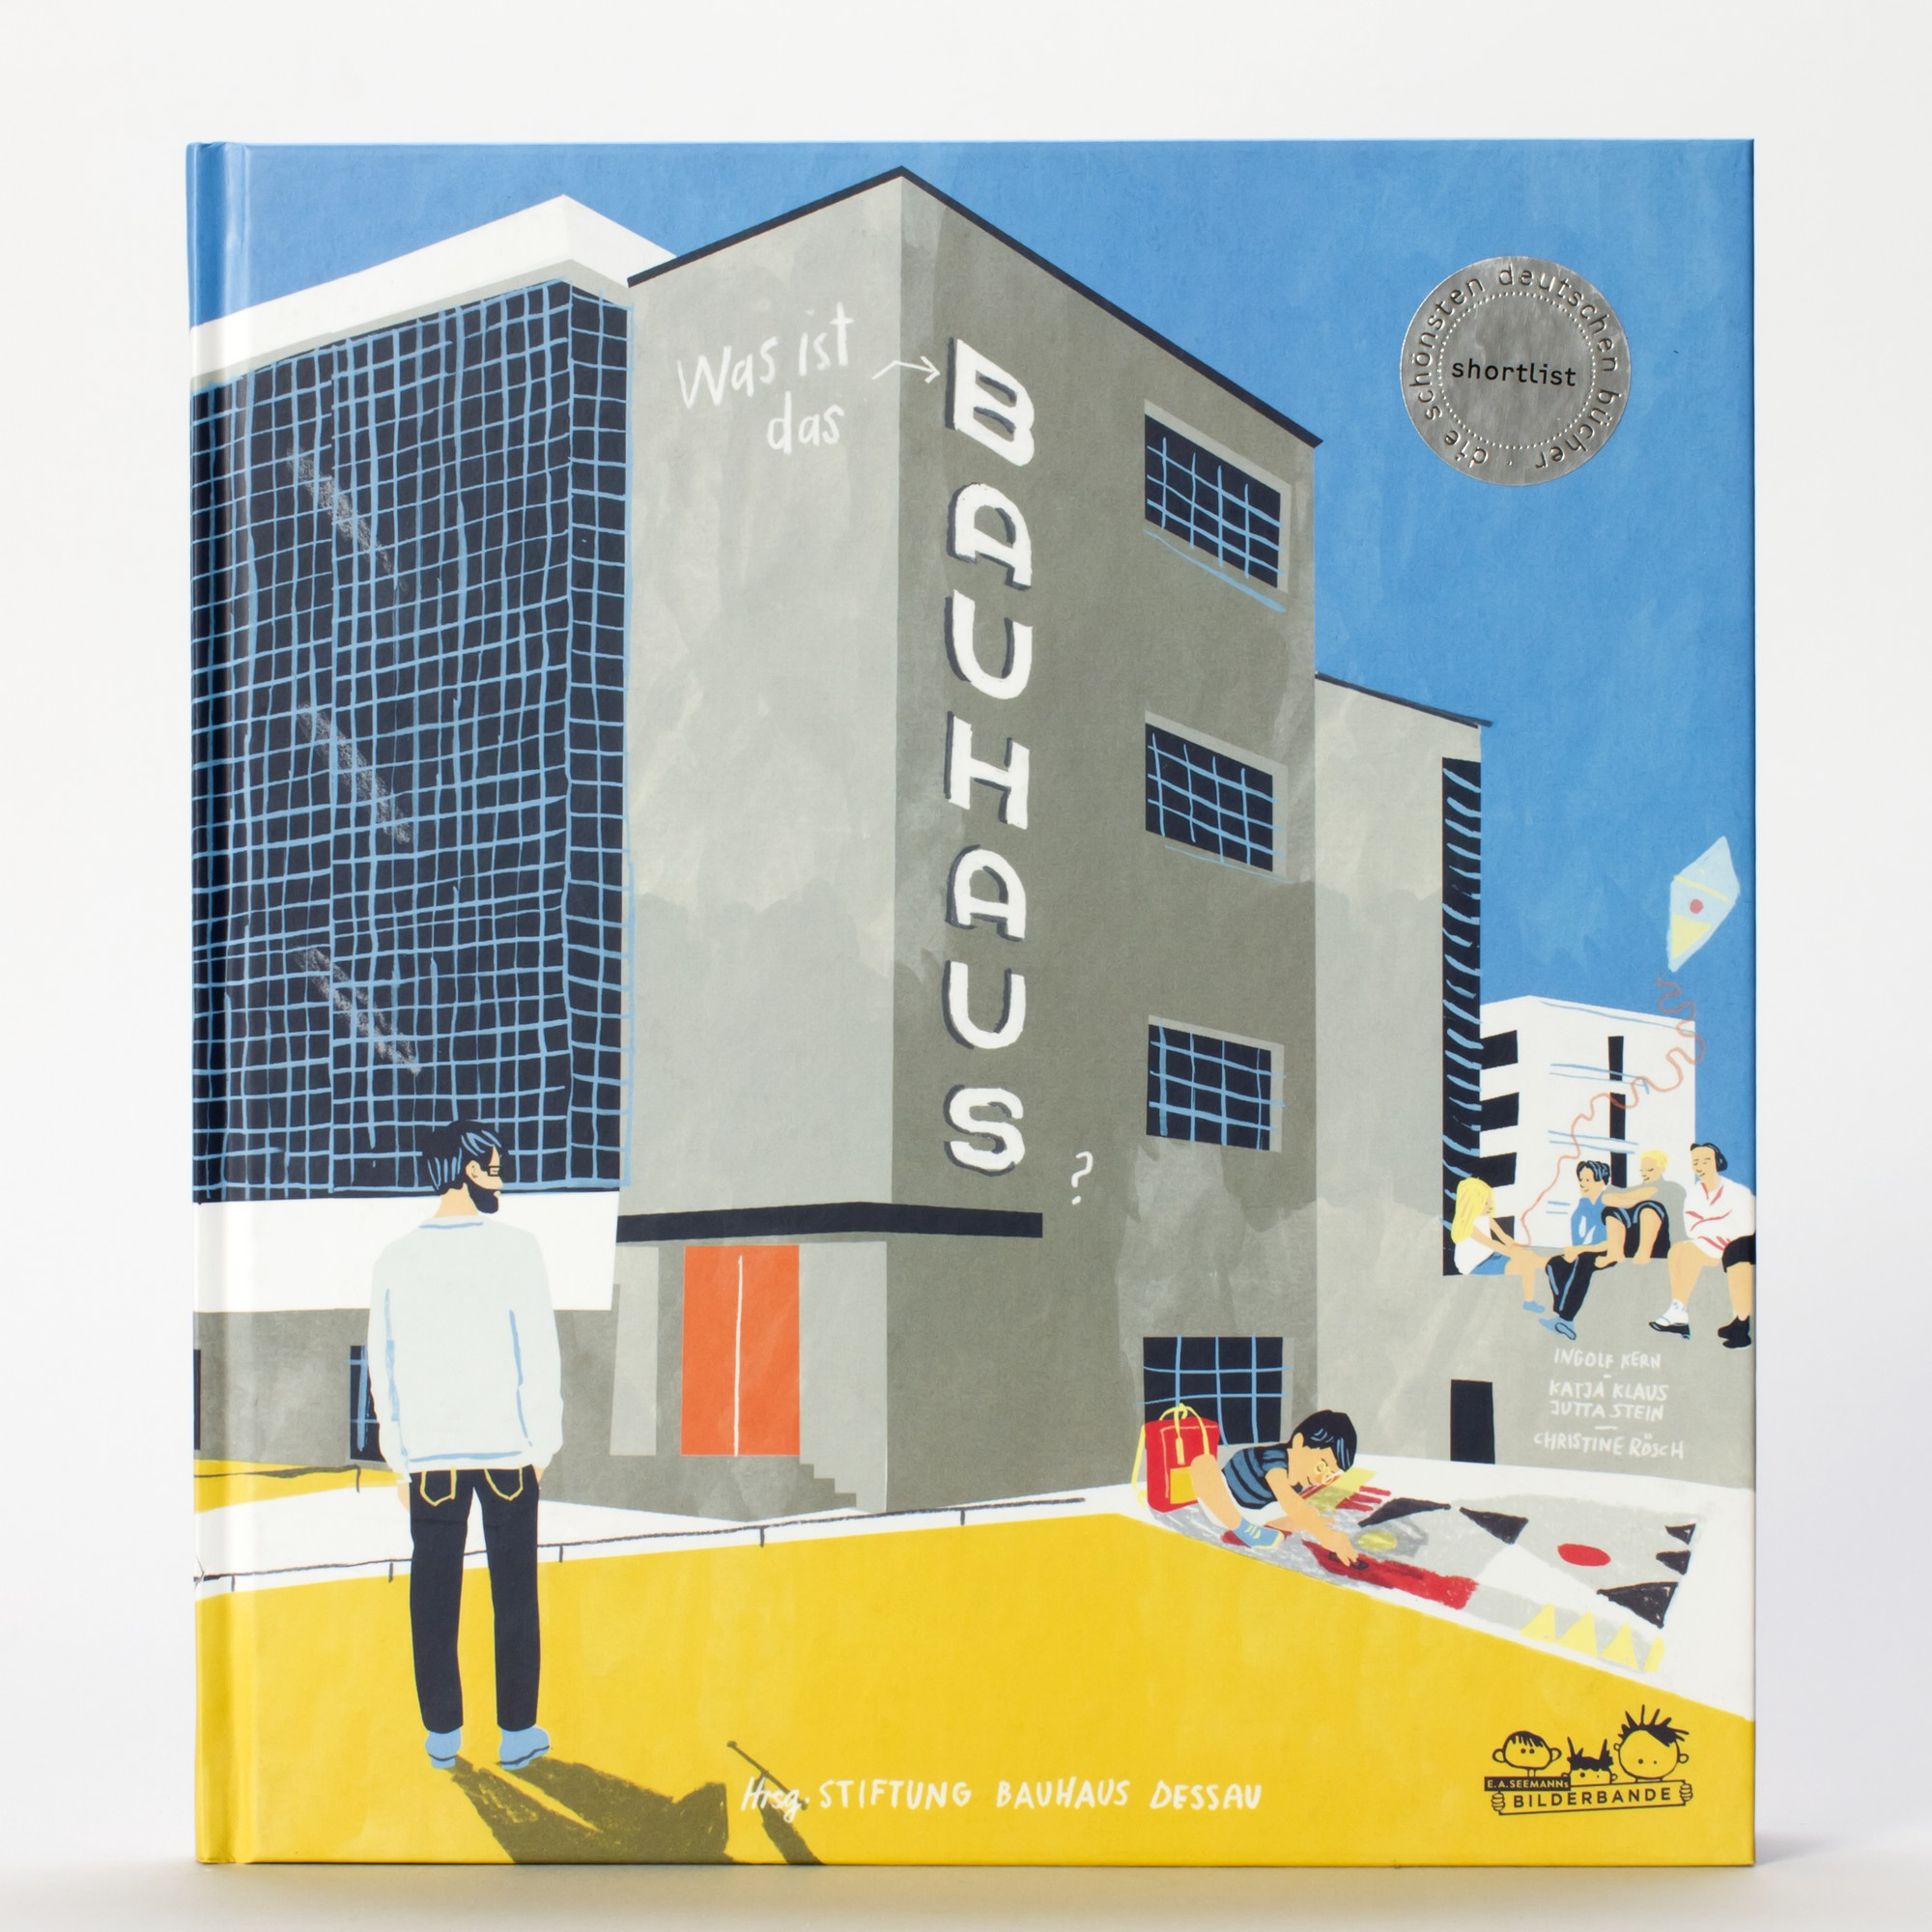 Full Size of Heizkörper Bauhaus Was Ist Das Buch Designshop Dessau Elektroheizkörper Bad Fenster Badezimmer Wohnzimmer Für Wohnzimmer Heizkörper Bauhaus